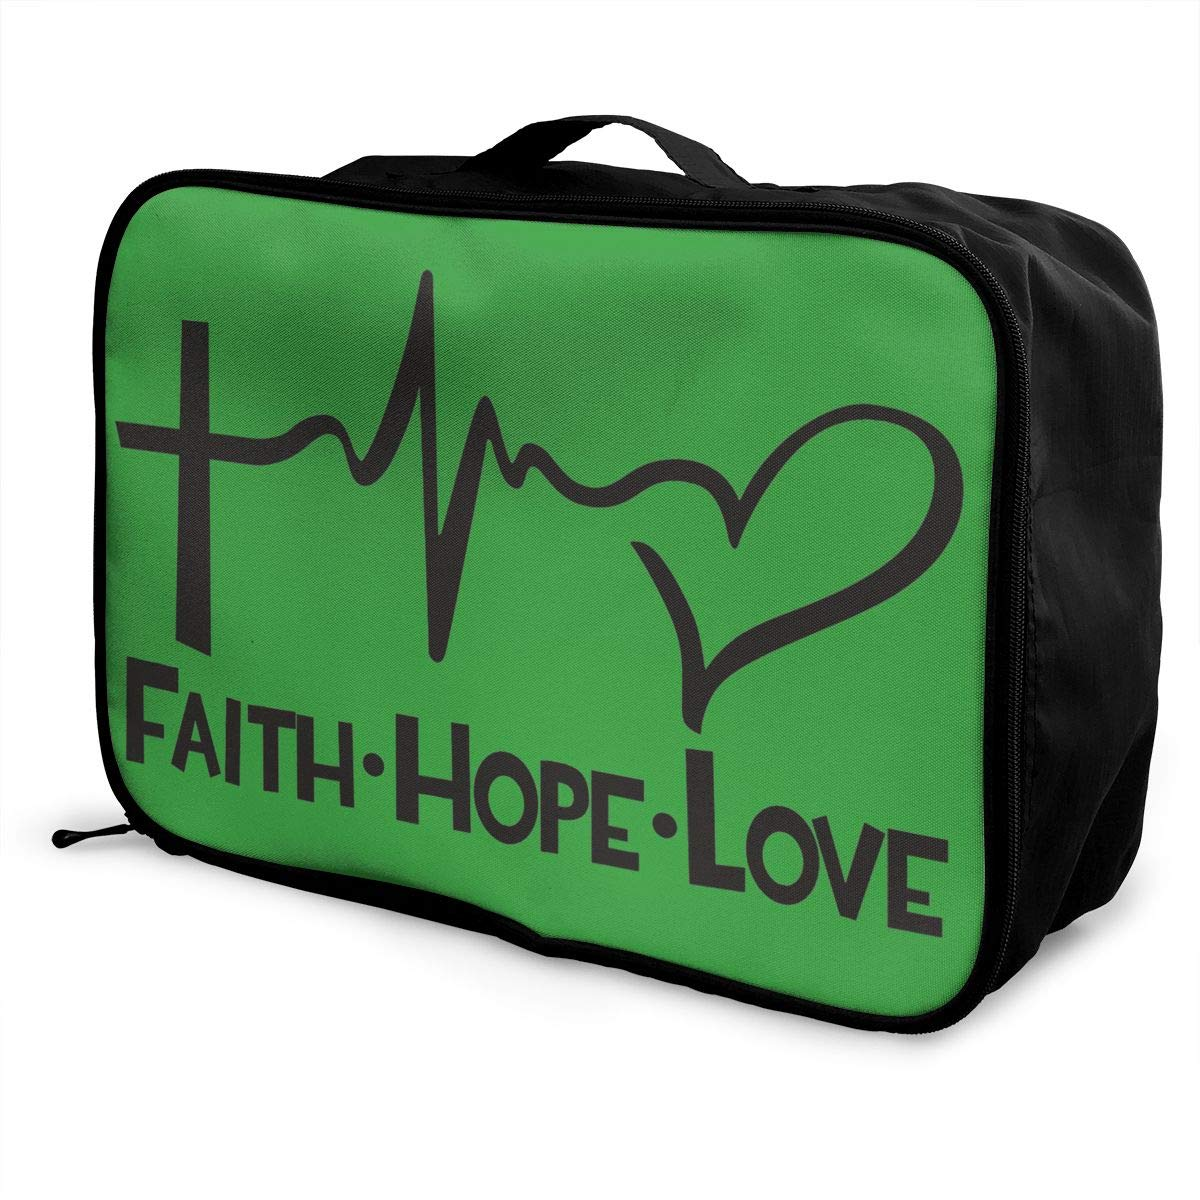 Travel Luggage Duffle Bag Lightweight Portable Handbag Faith Hope Love Large Capacity Waterproof Foldable Storage Tote